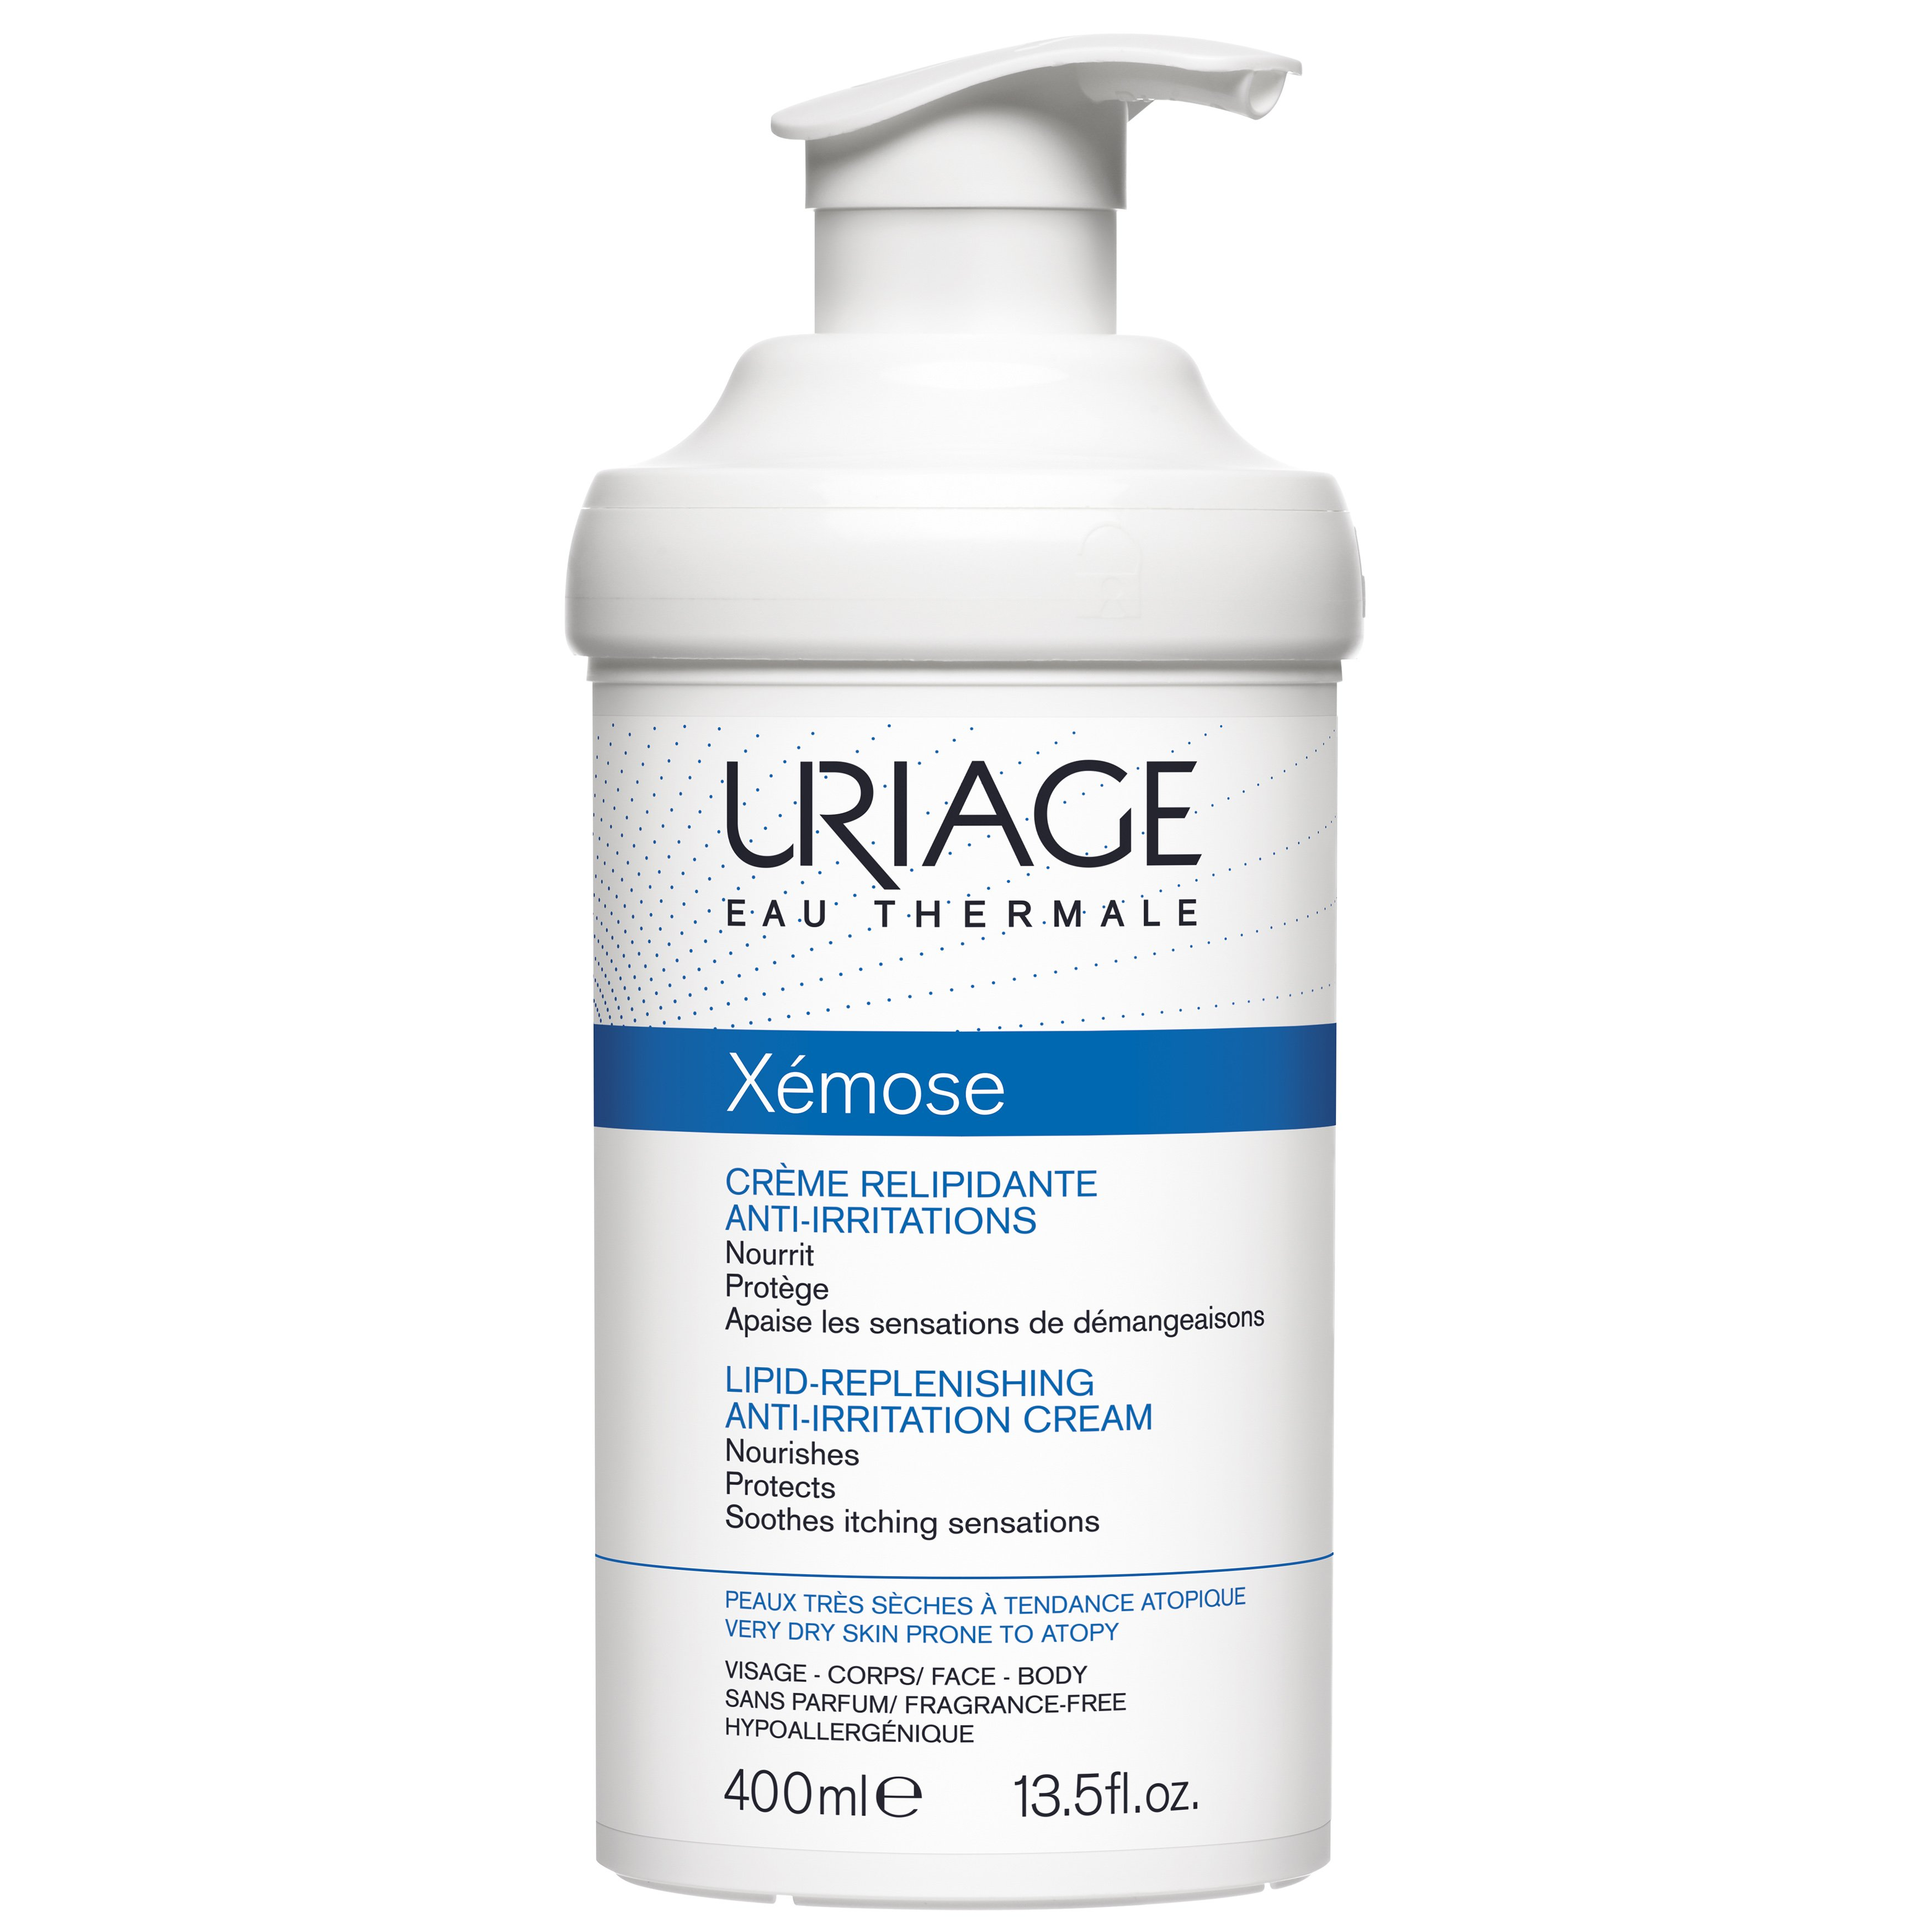 Uriage Eau Thermale Xemose Lipid Replenishing Anti Irritation Cream Καταπραΰνει Αμέσως την Αίσθηση Κνησμού 400ml